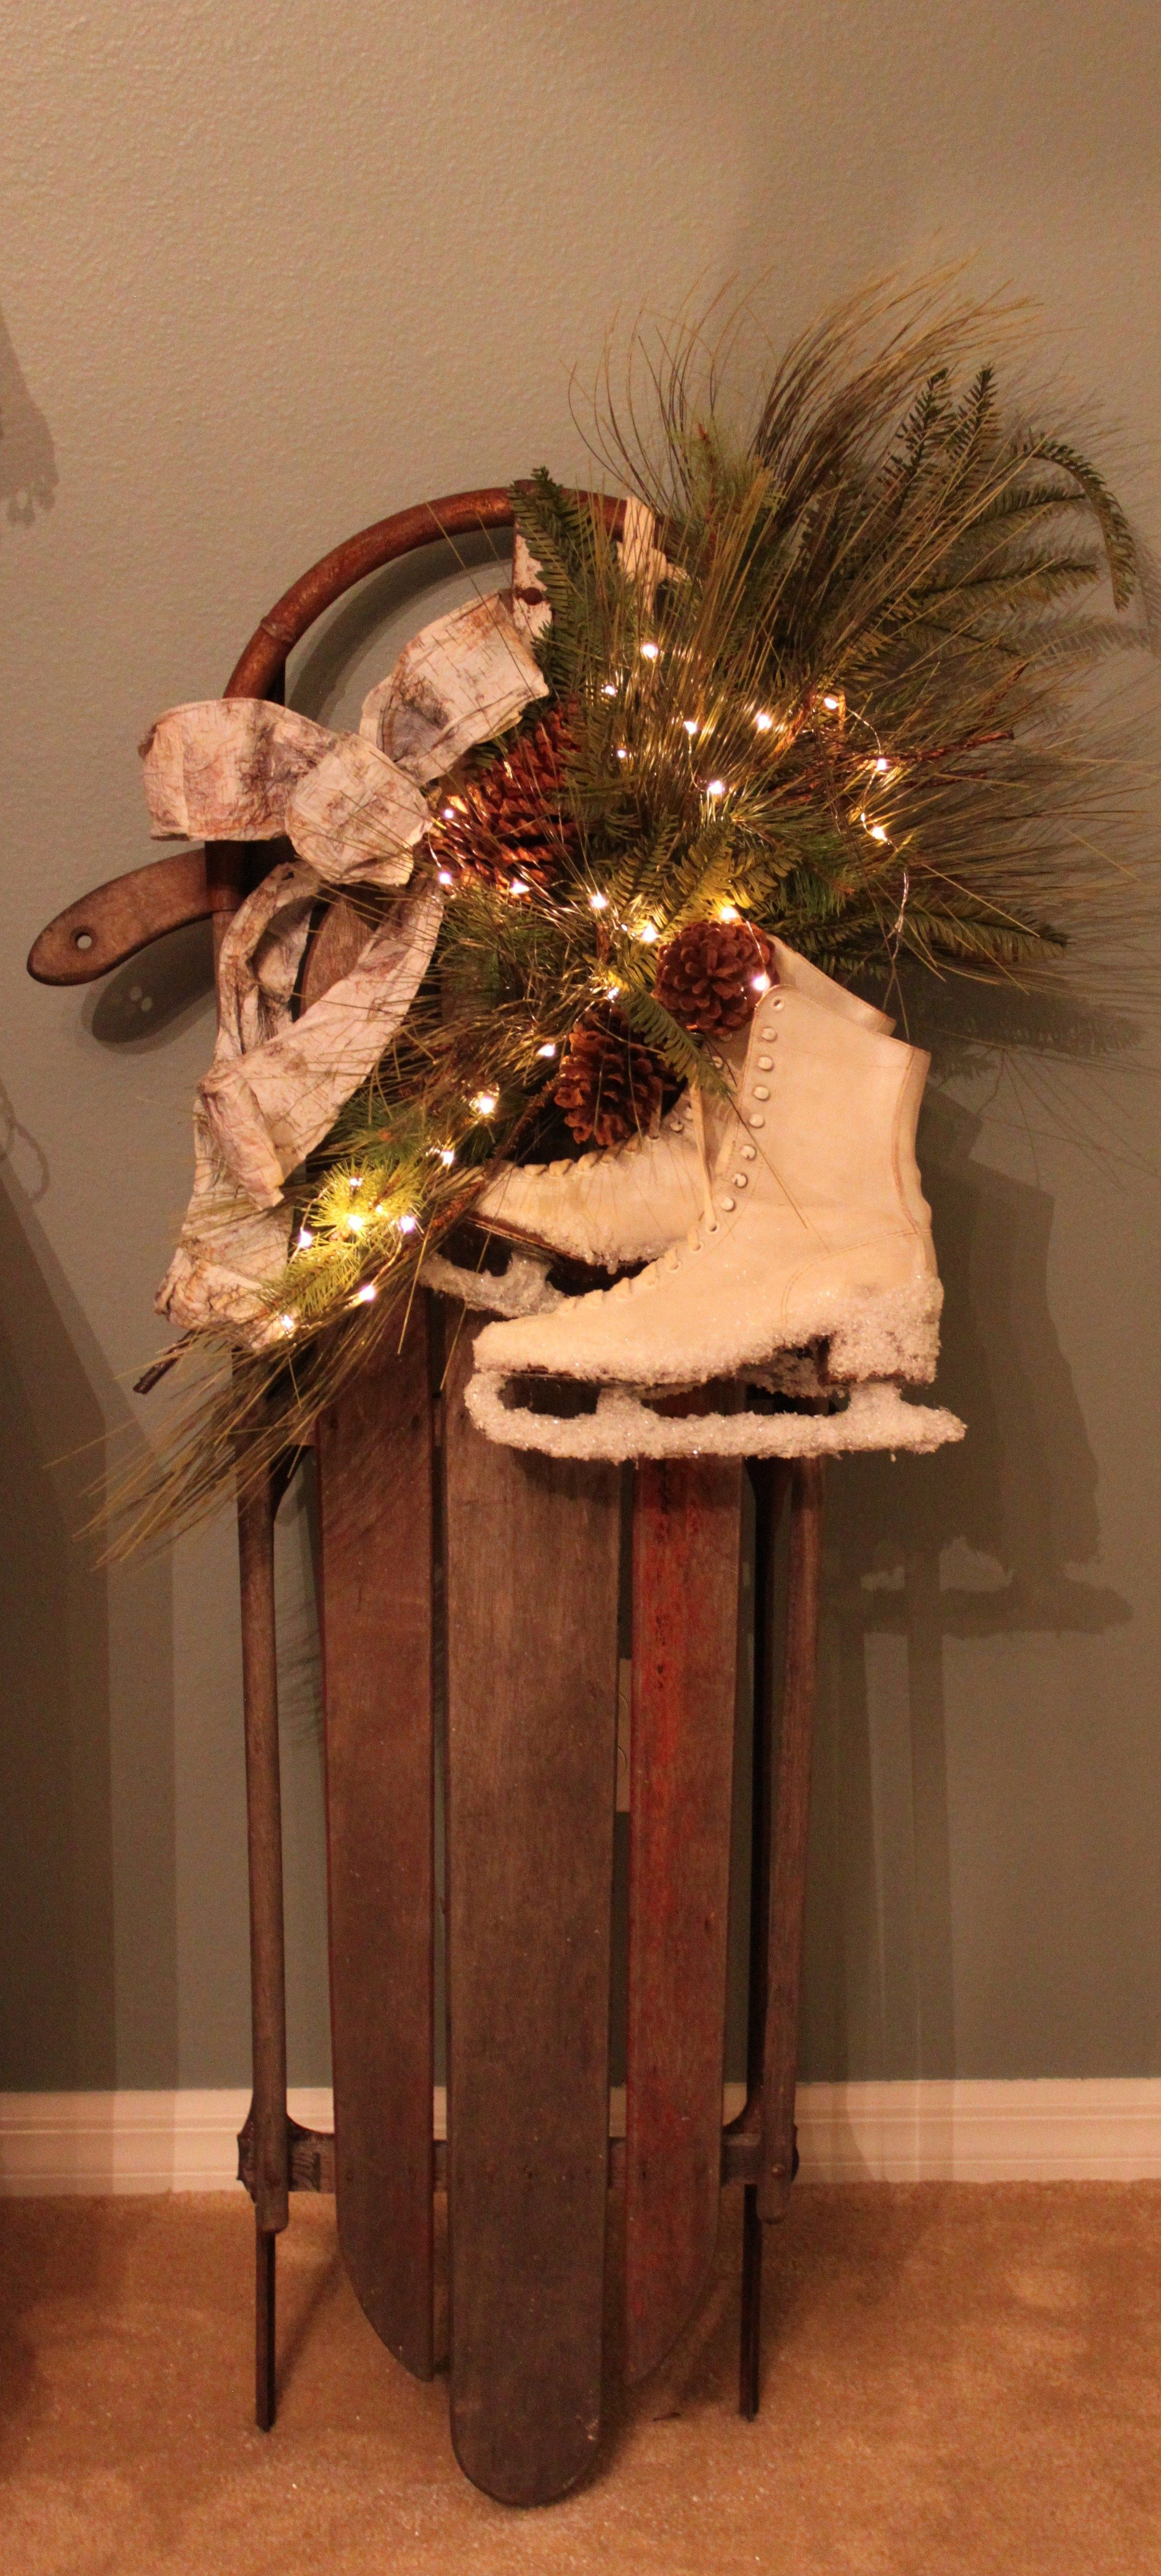 Stockings/Ice Skates on Pinterest | Christmas Stockings, Sled and ...